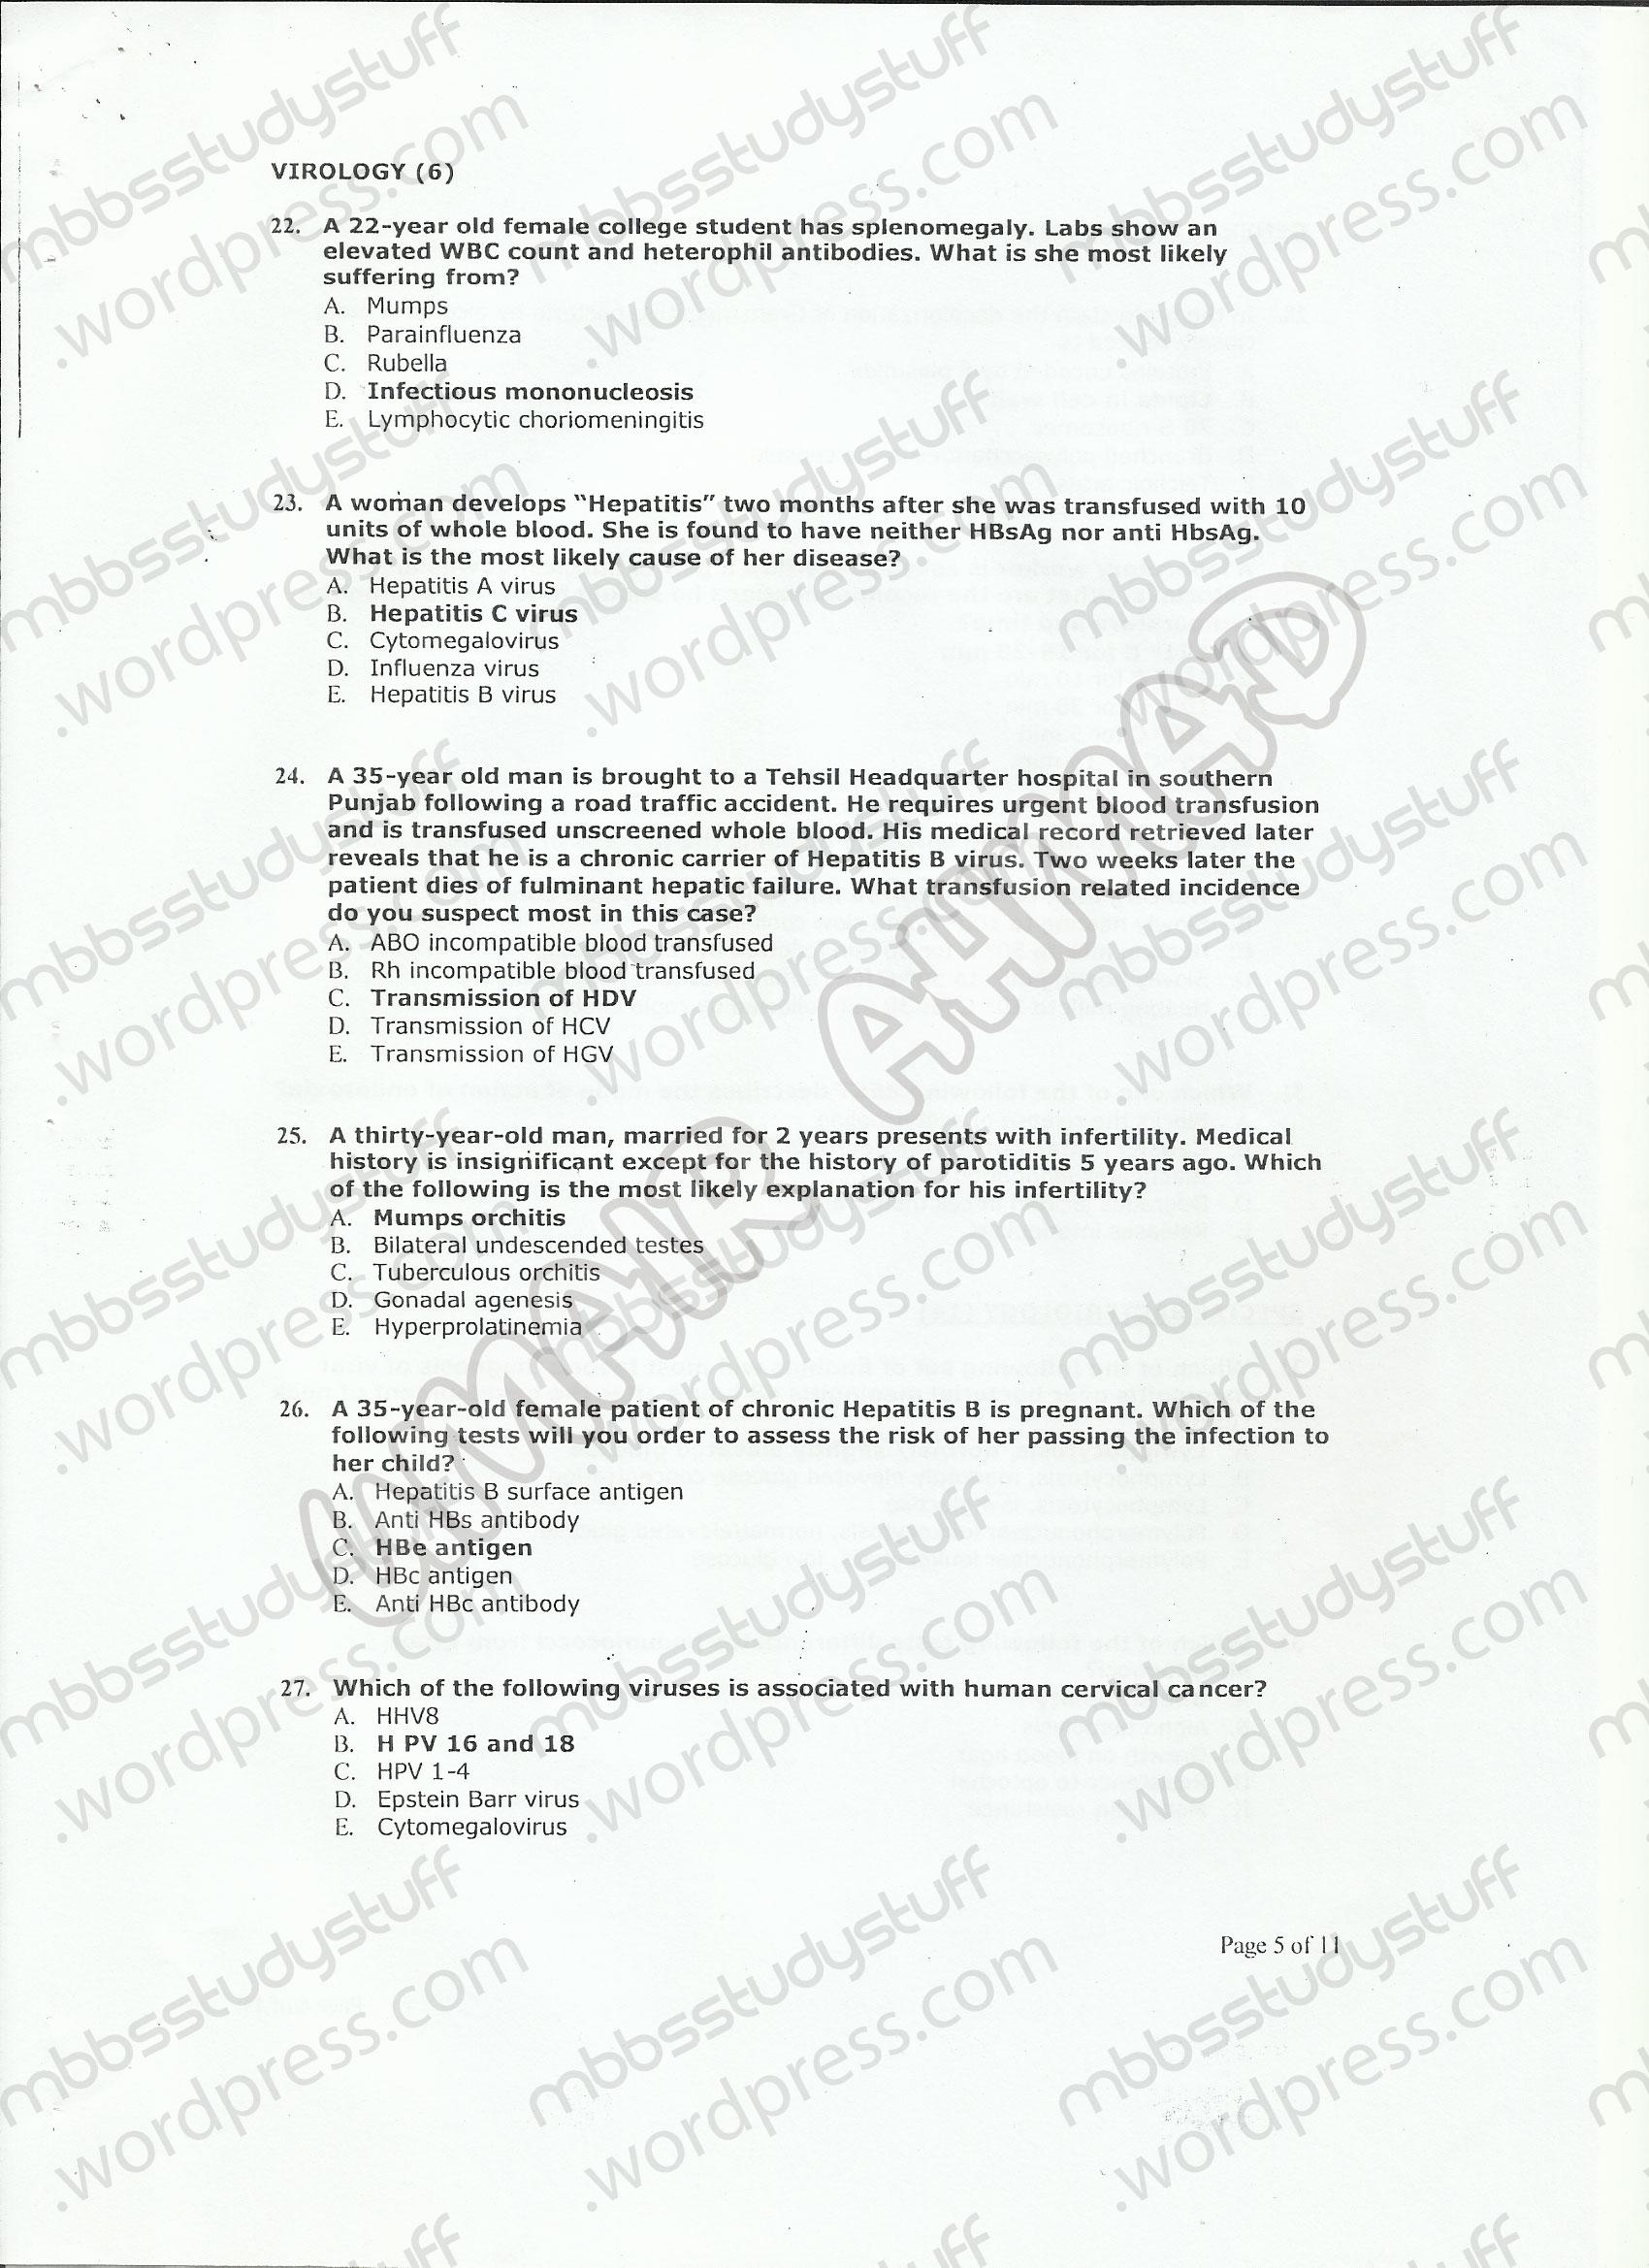 medical helminthology mcqs